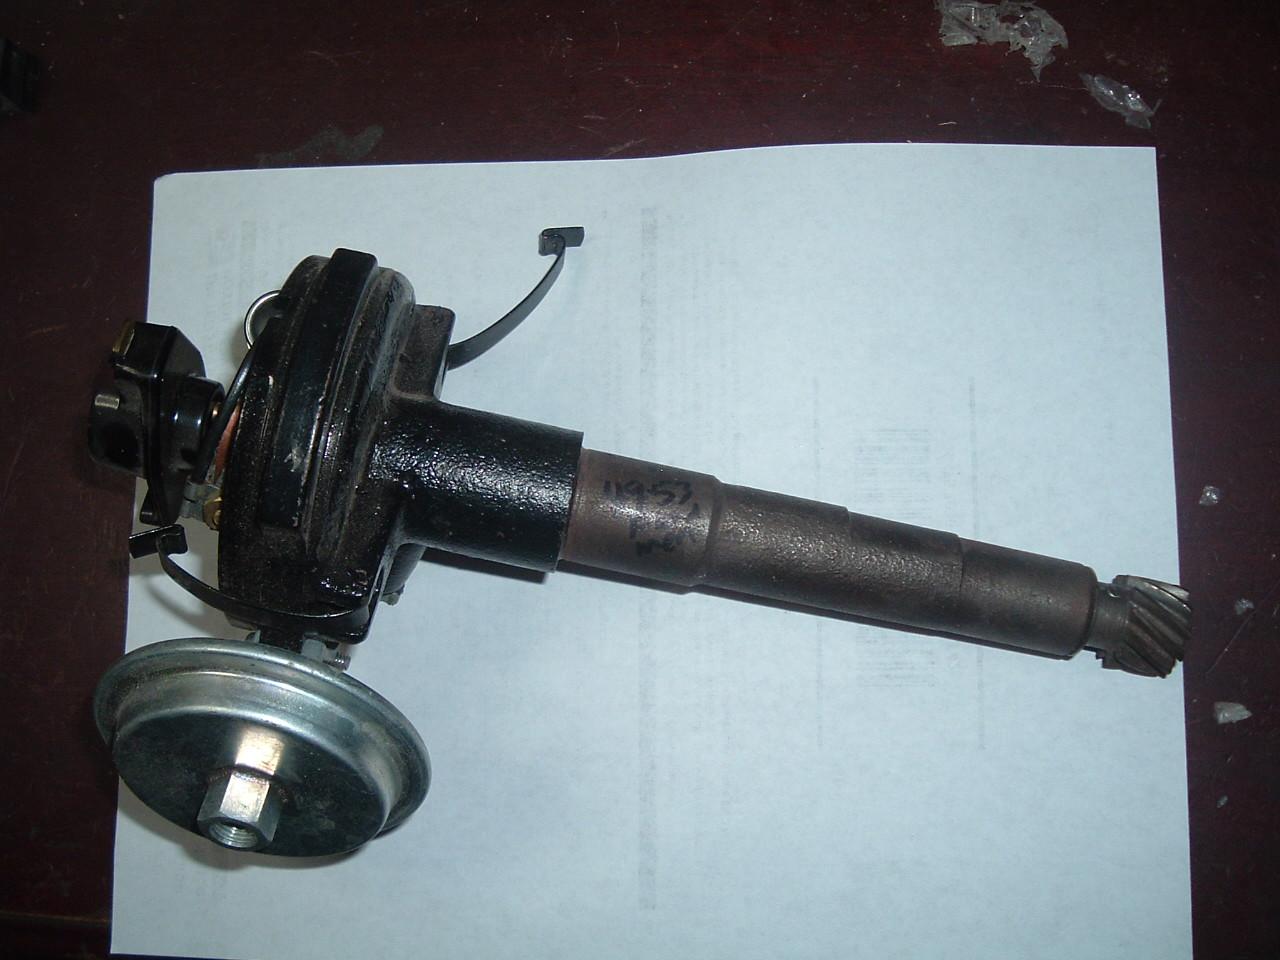 1949 50 51 52 ford mercury flathead v-8 rebuilt distributor (z 49-53forddist)